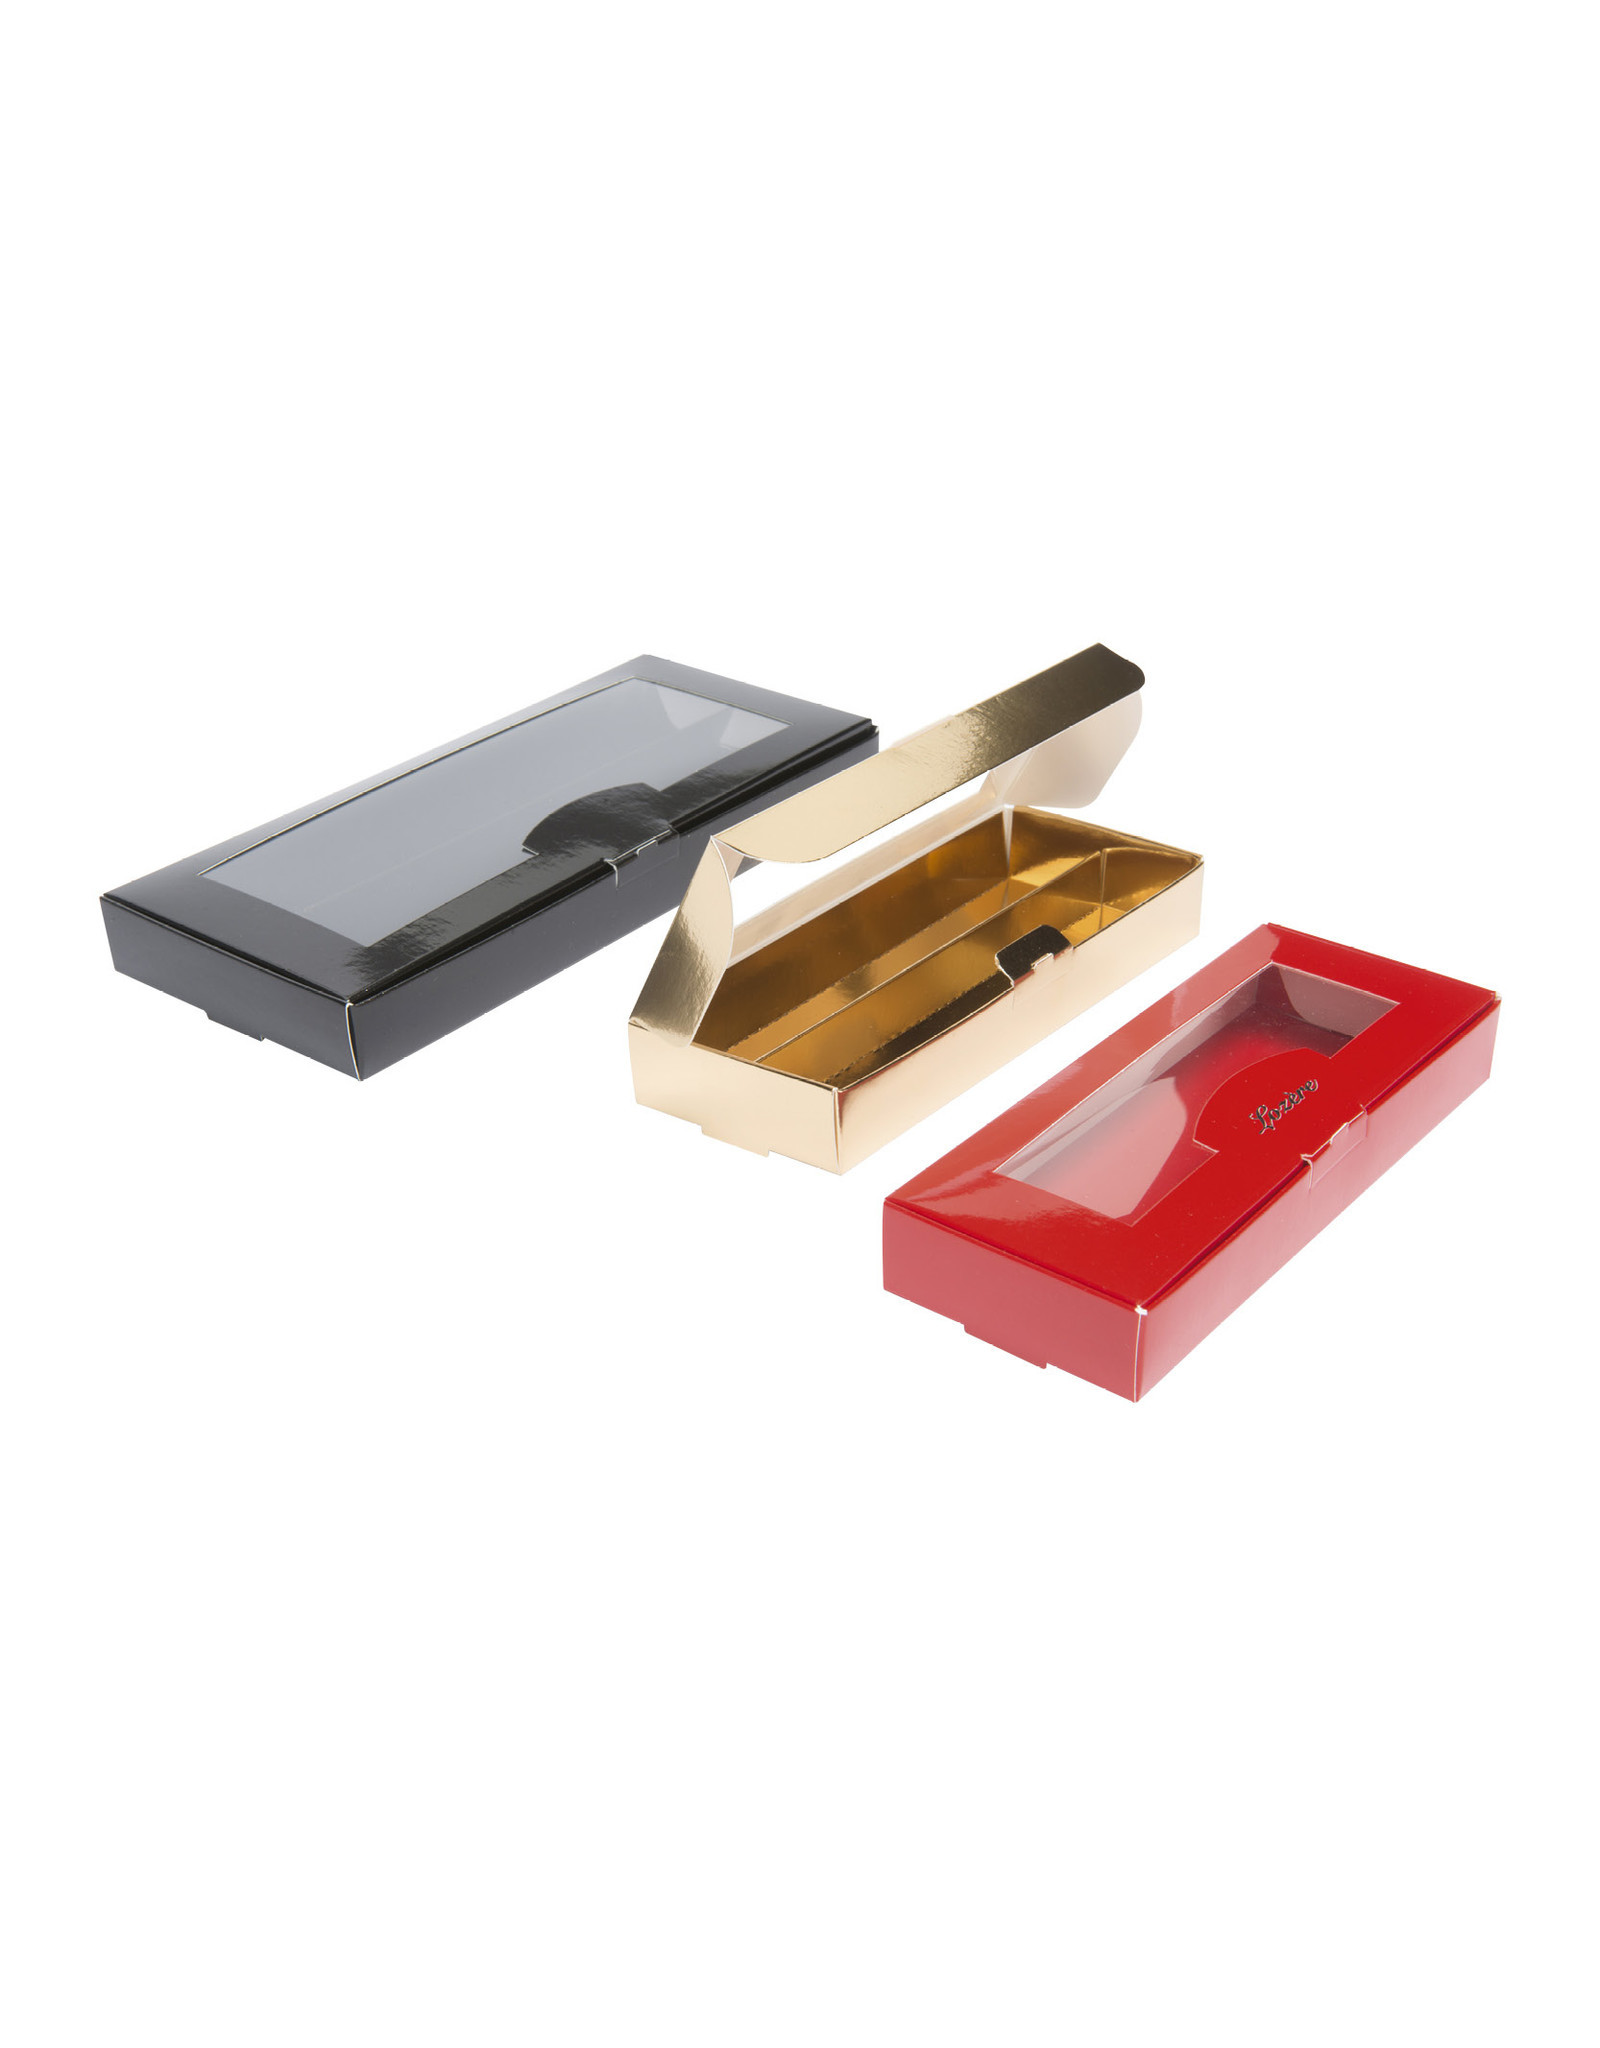 Parallel Box 21,2 x 9,2 x 2,2cm